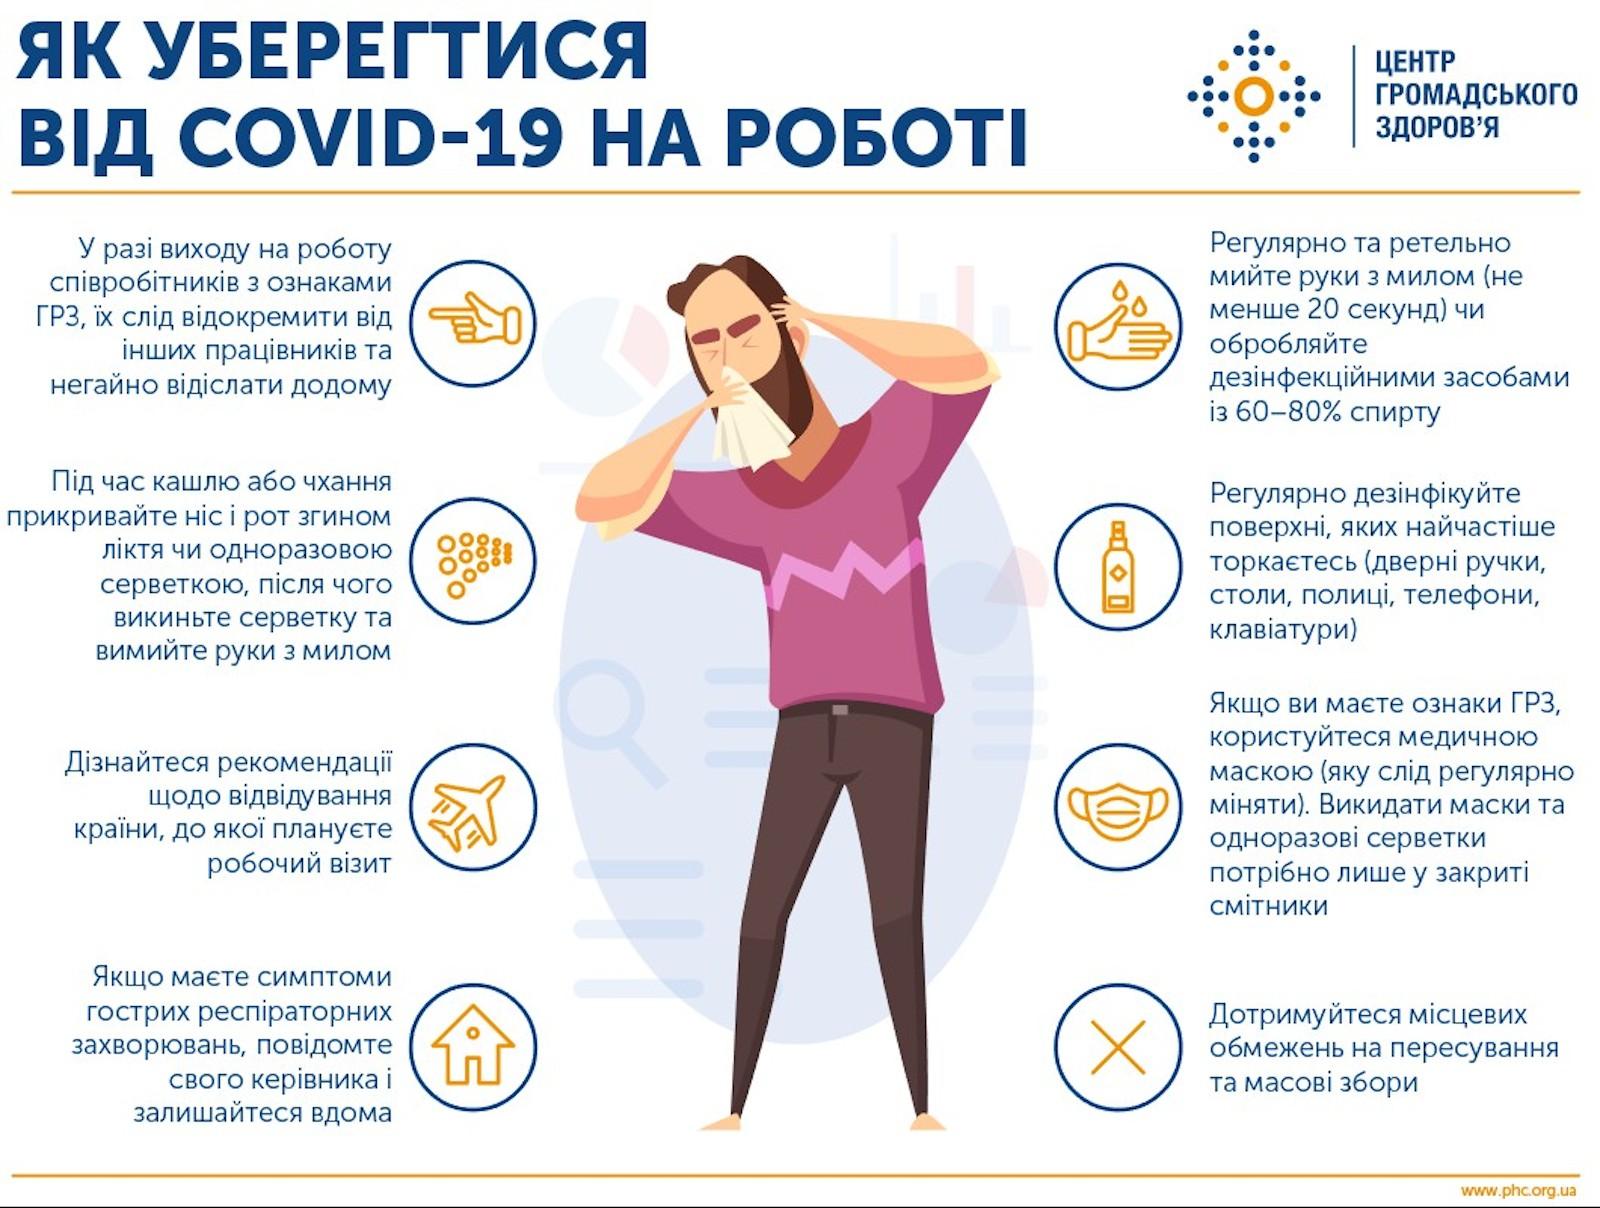 mldc.vn.ua-covid19-01